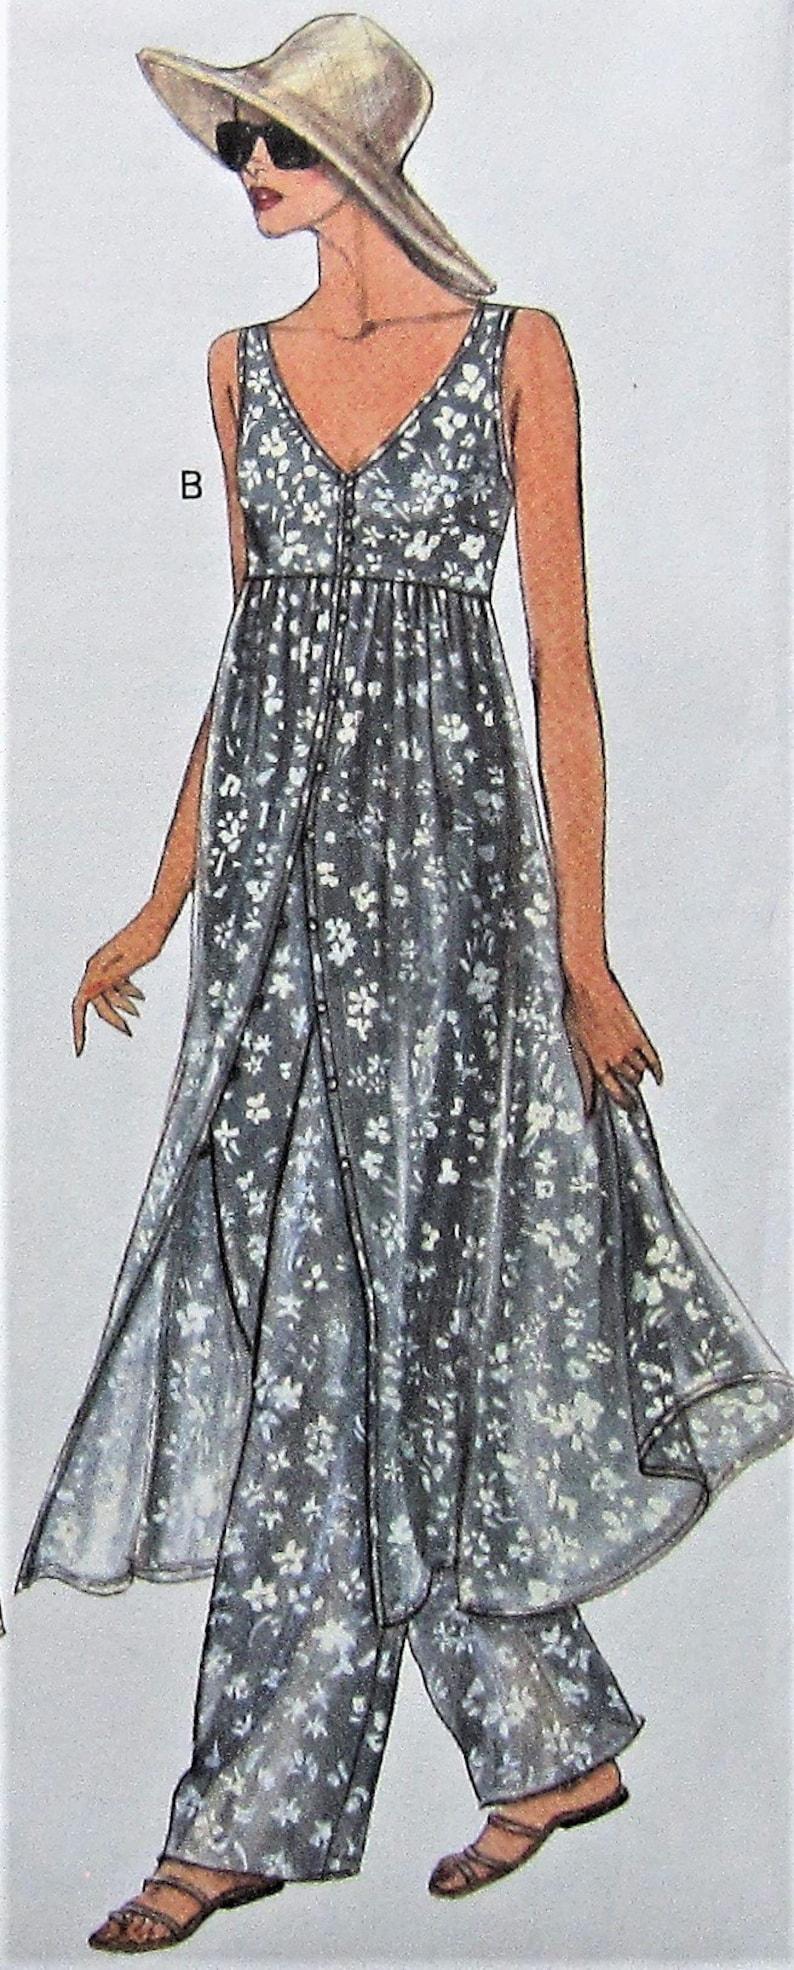 c6a919ac3f426 Tunic Dress and Pants Sewing Pattern UNCUT Vogue 8974 Sizes | Etsy